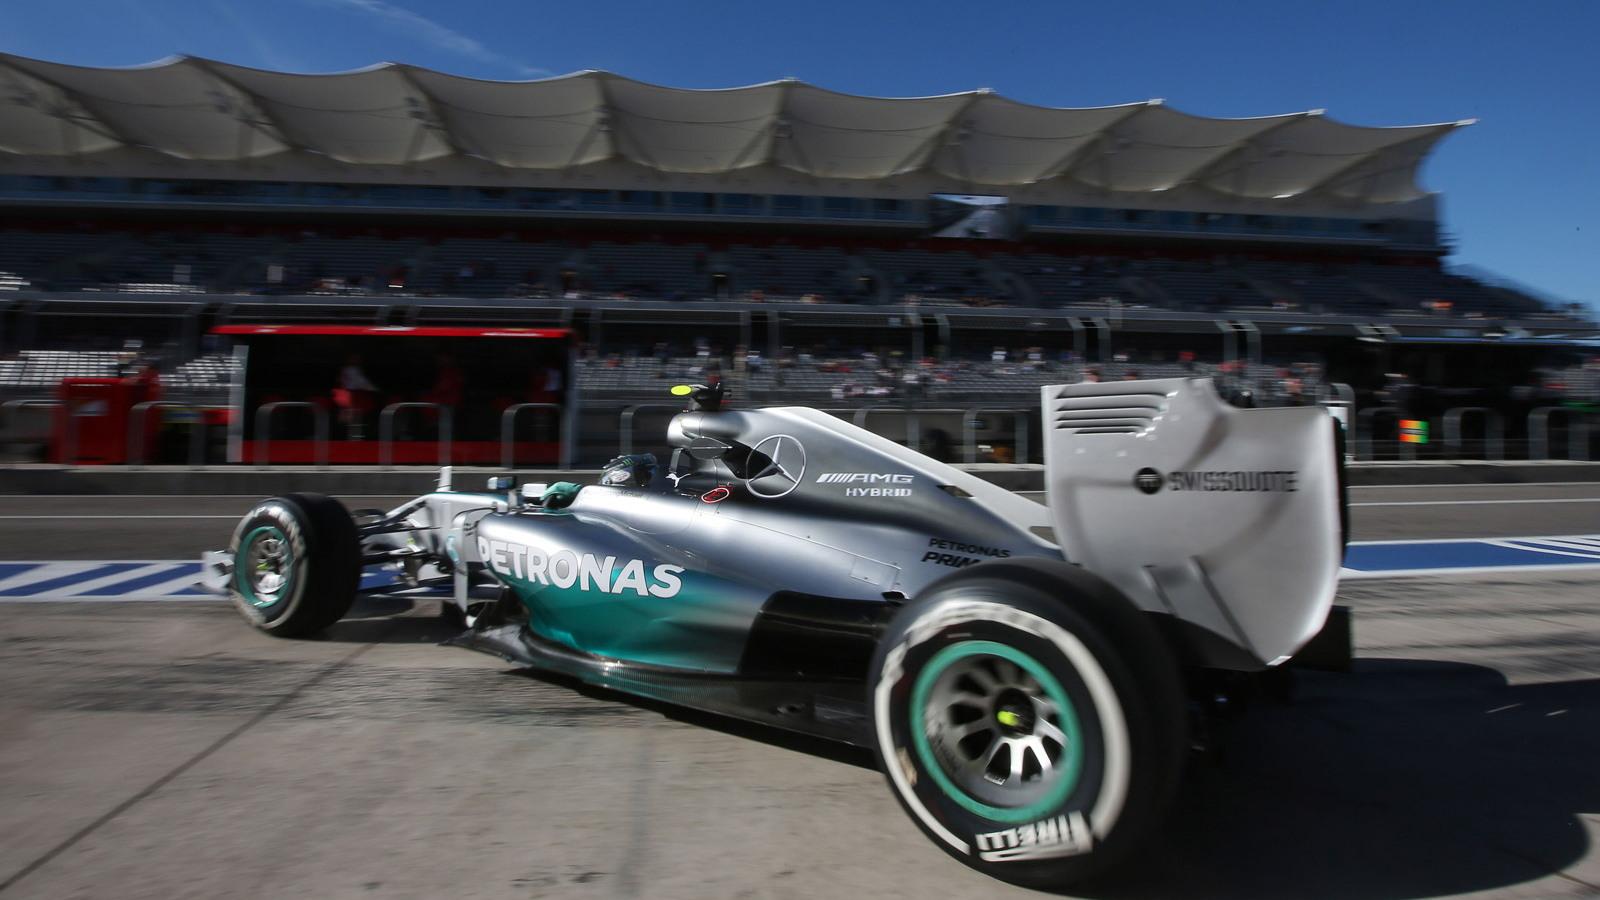 Mercedes AMG at the 2014 Formula One United States Grand Prix